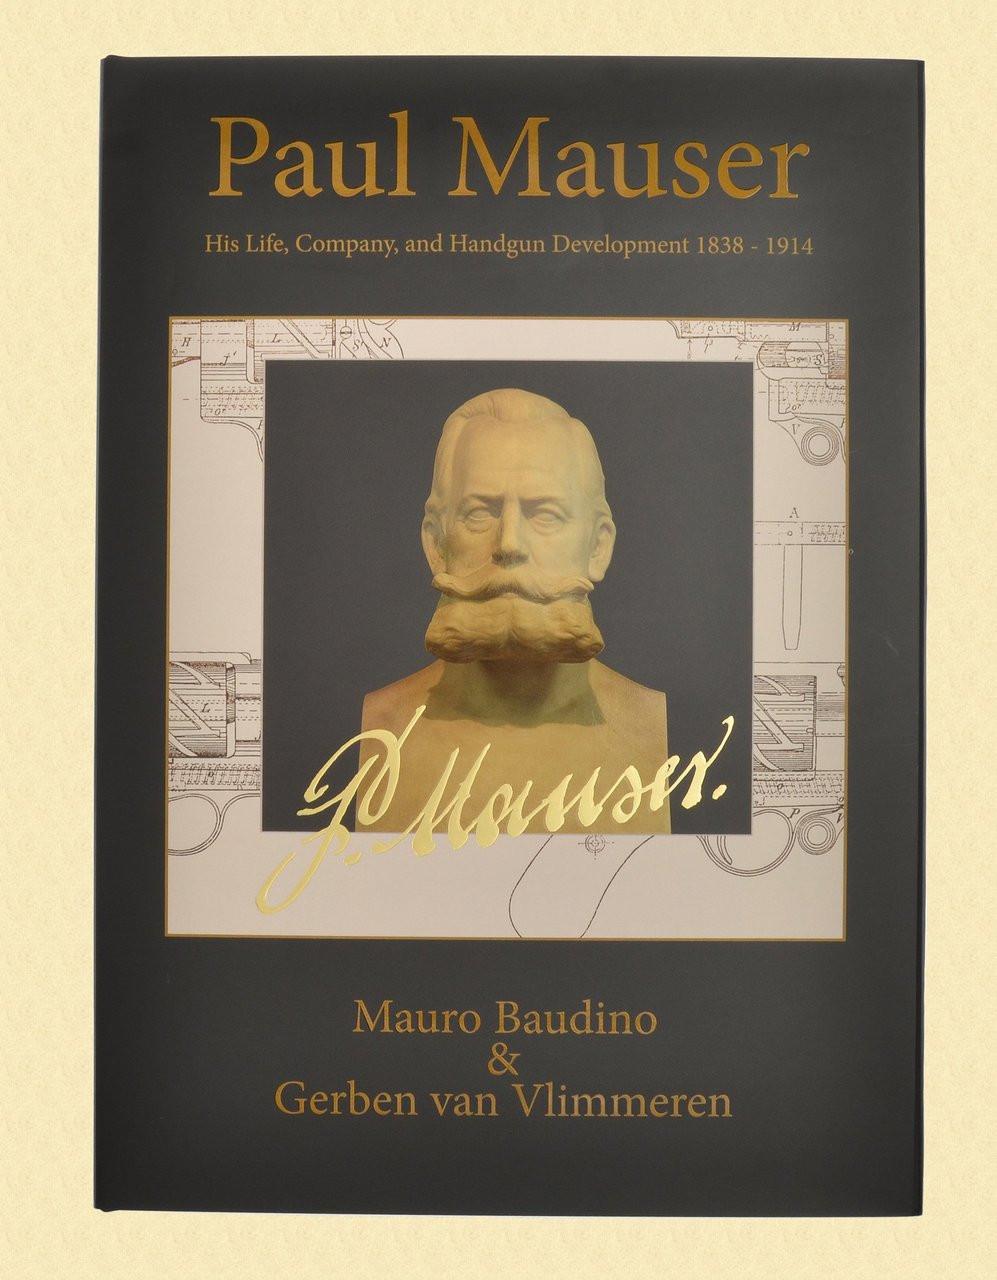 PAUL MAUSER